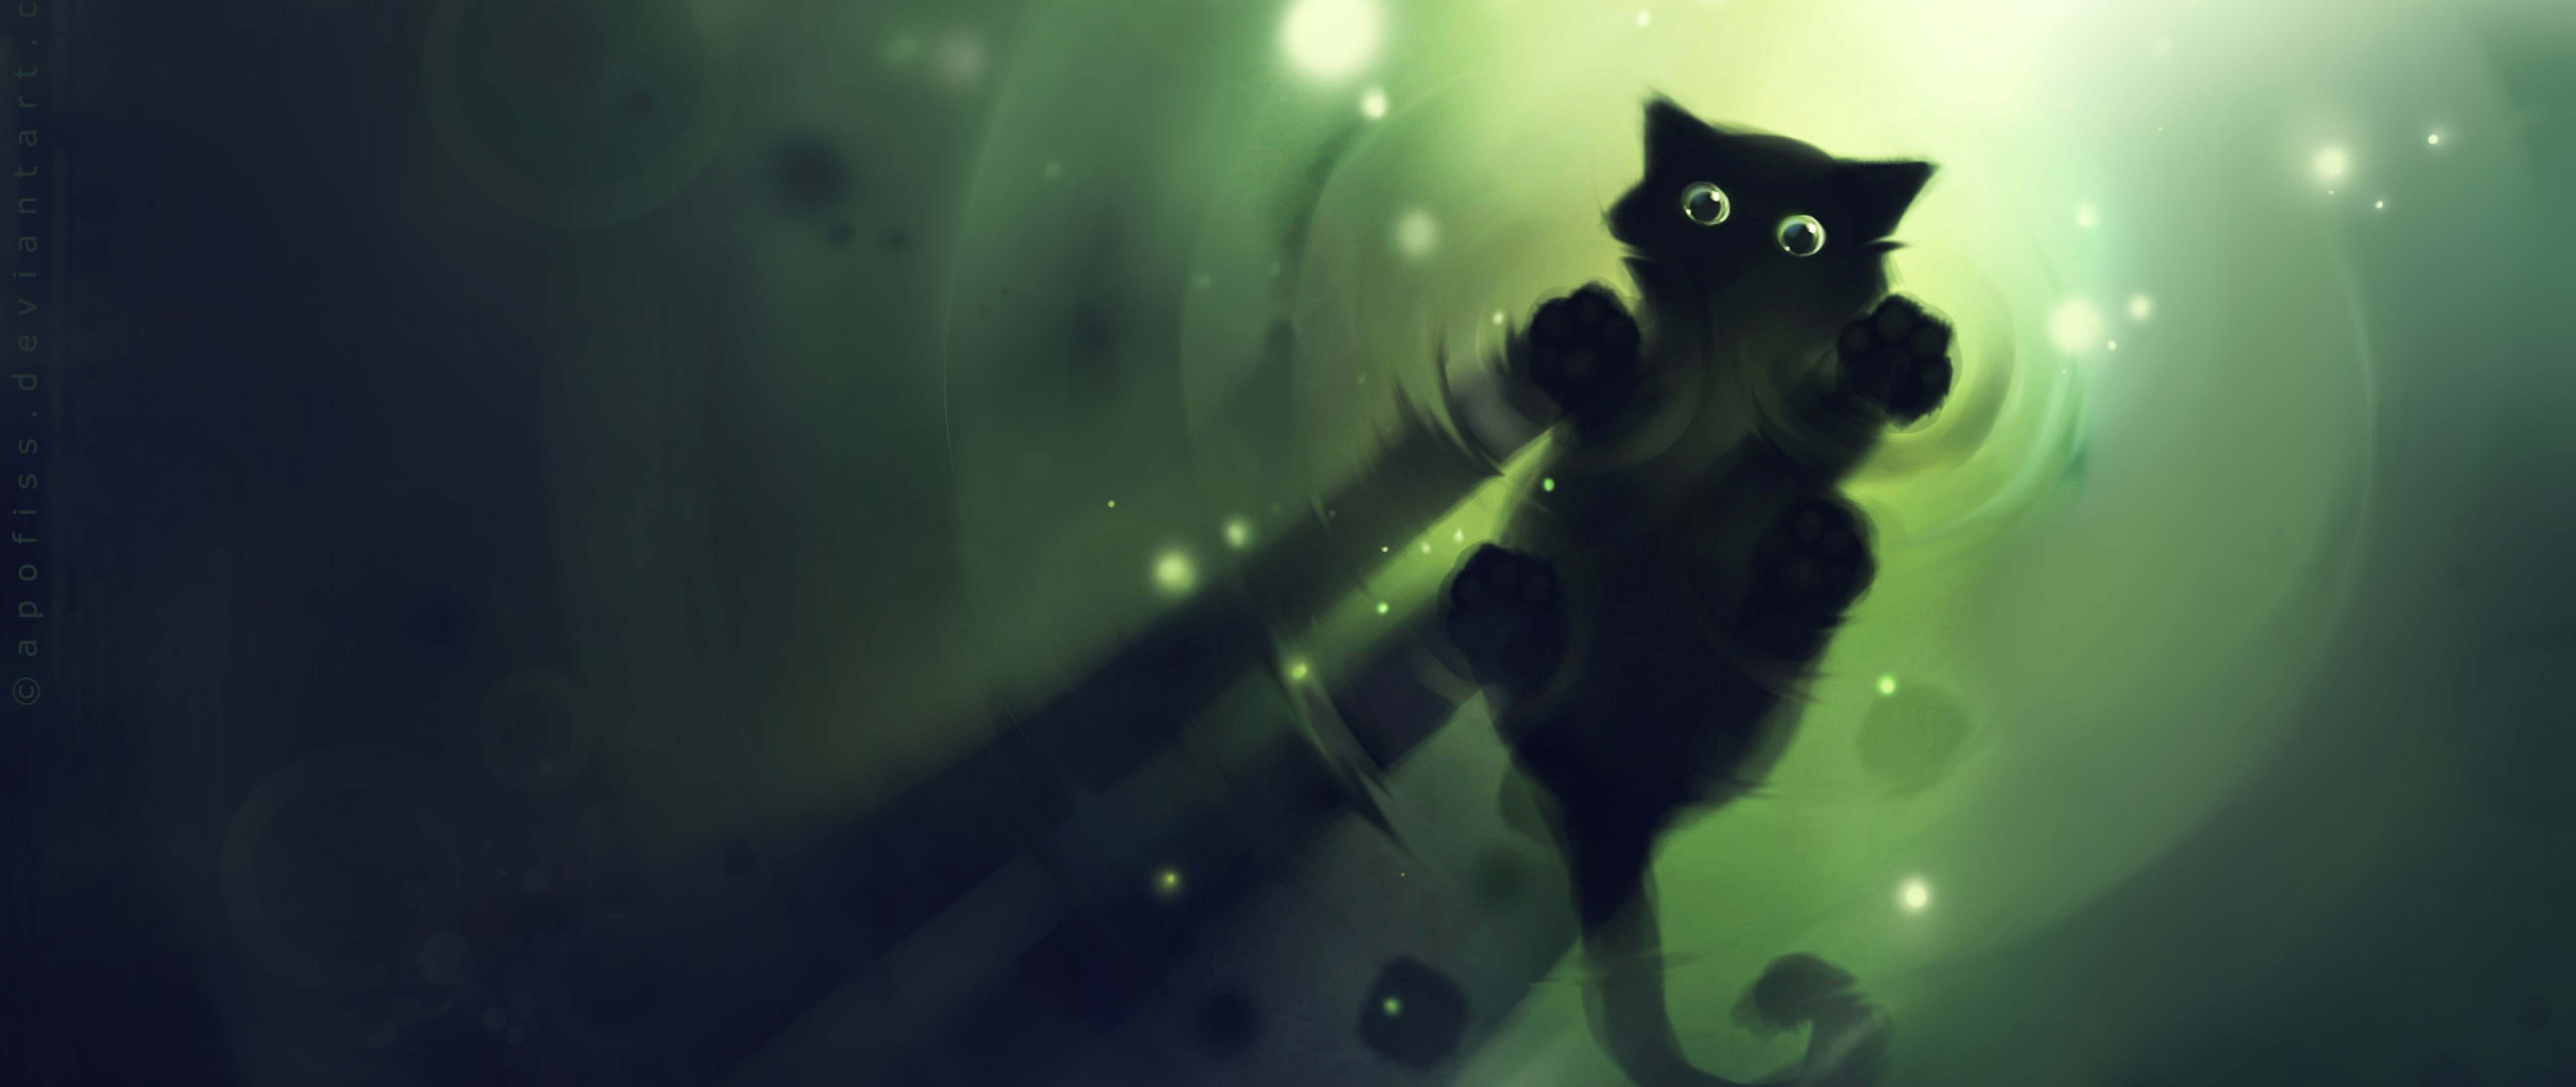 Cute Animated Cat Cartoon Background Wallpaper For Desktop And Mobiles 4k Ultra Hd Wide Tv Hd Wallpaper Wallpapers Net